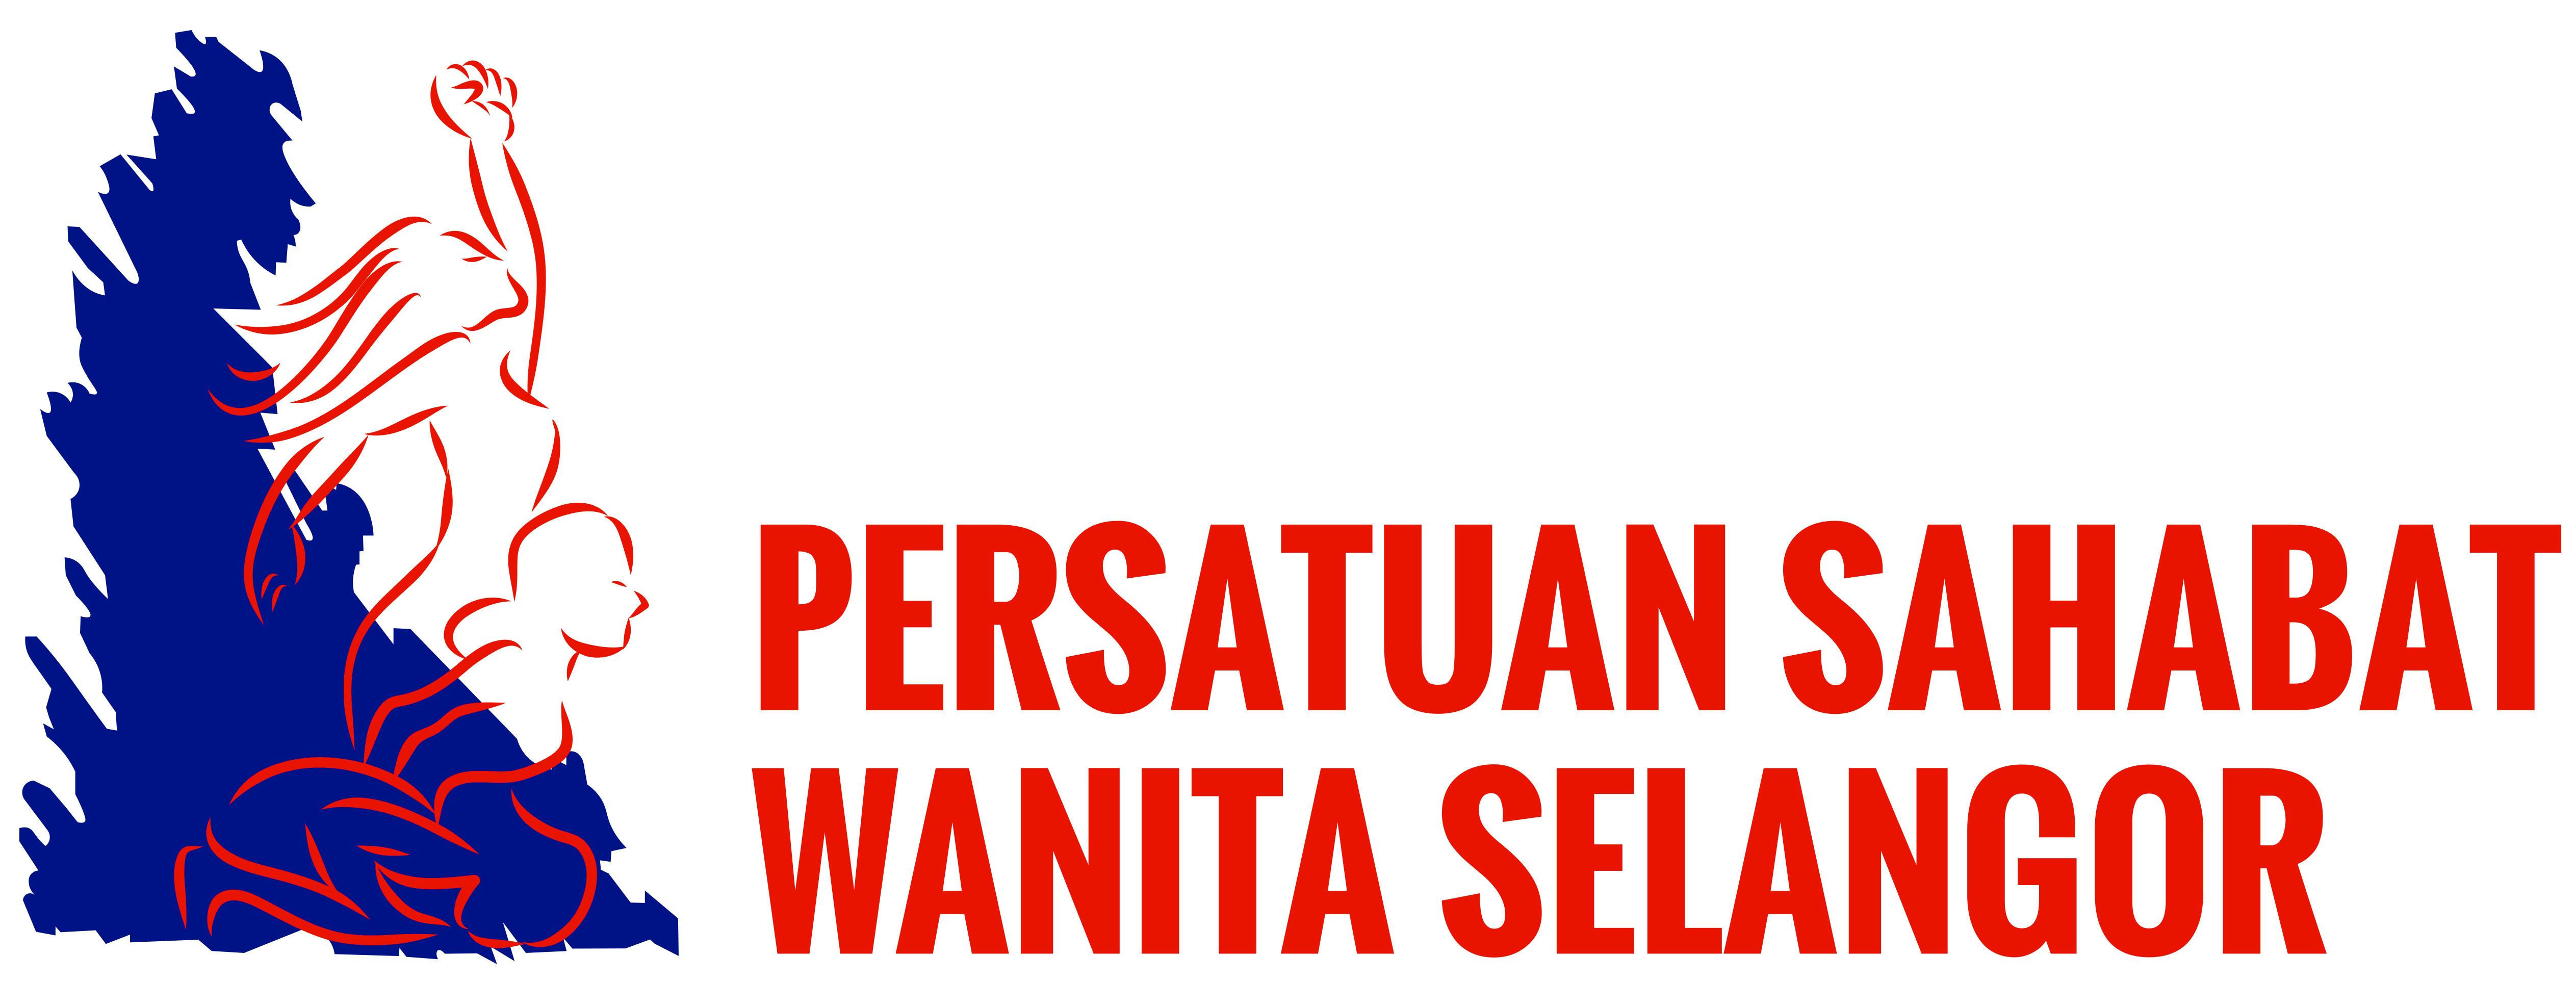 Persatuan Sahabat Wanita Selangor